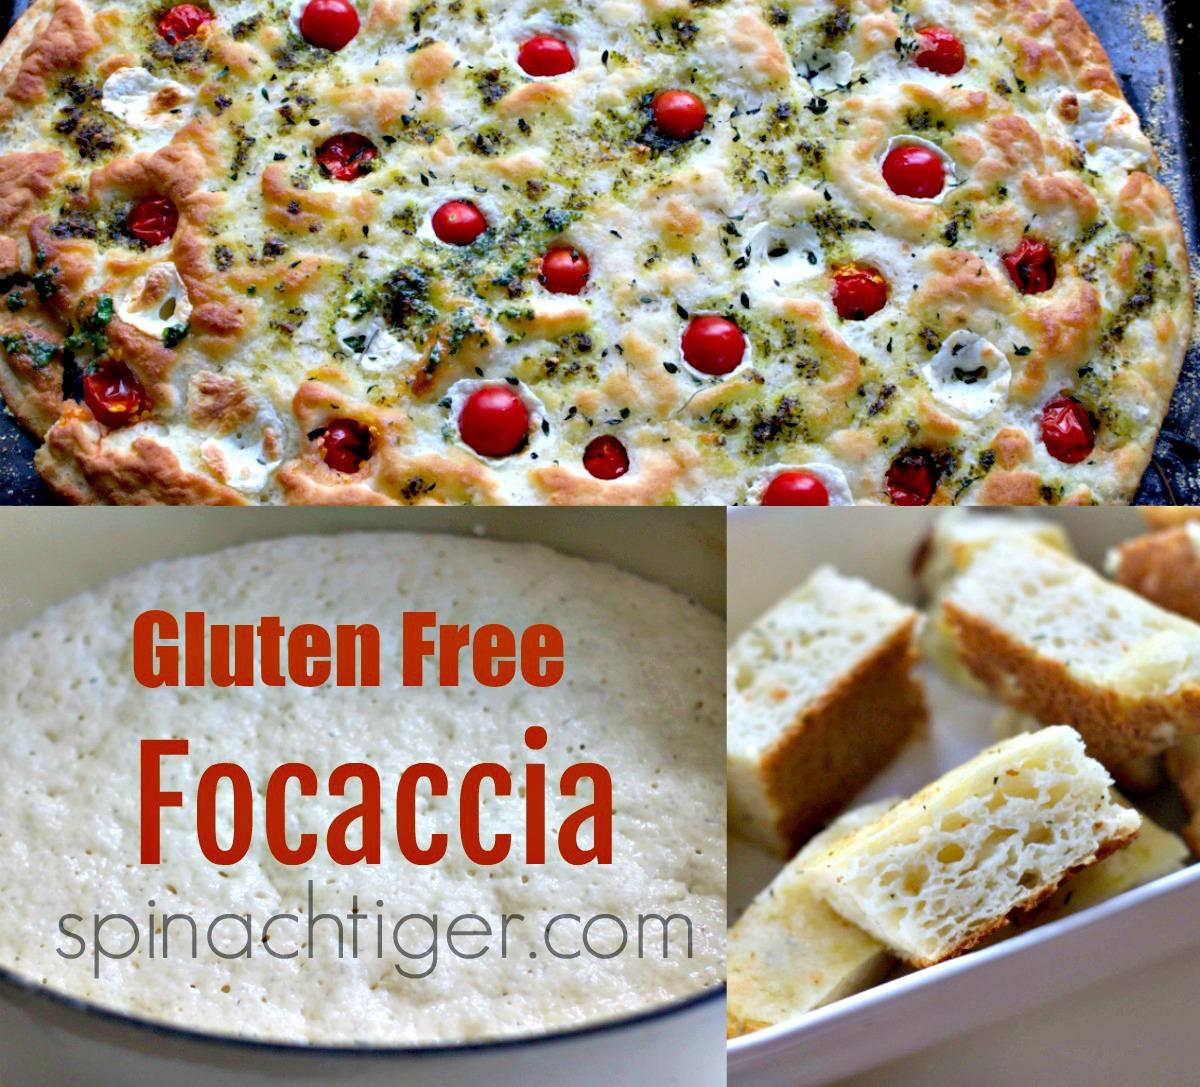 Gluten Free Focaccia from Spinach Tiger